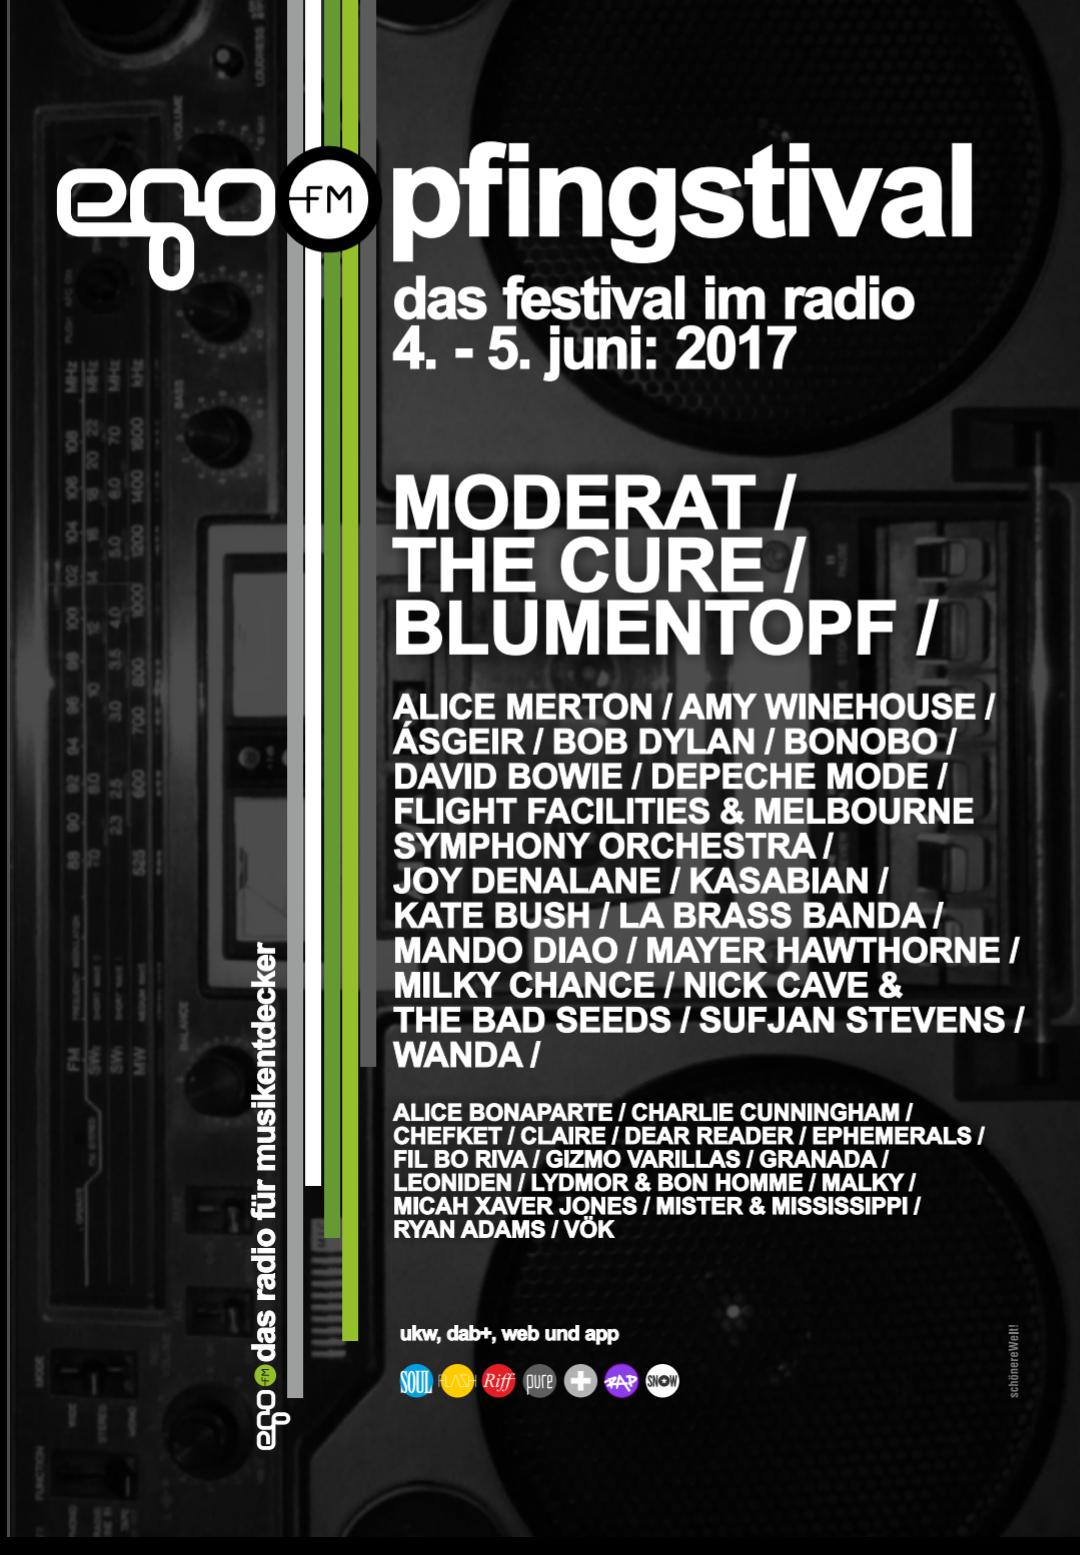 Das-Fesitval-im-Radio 2017